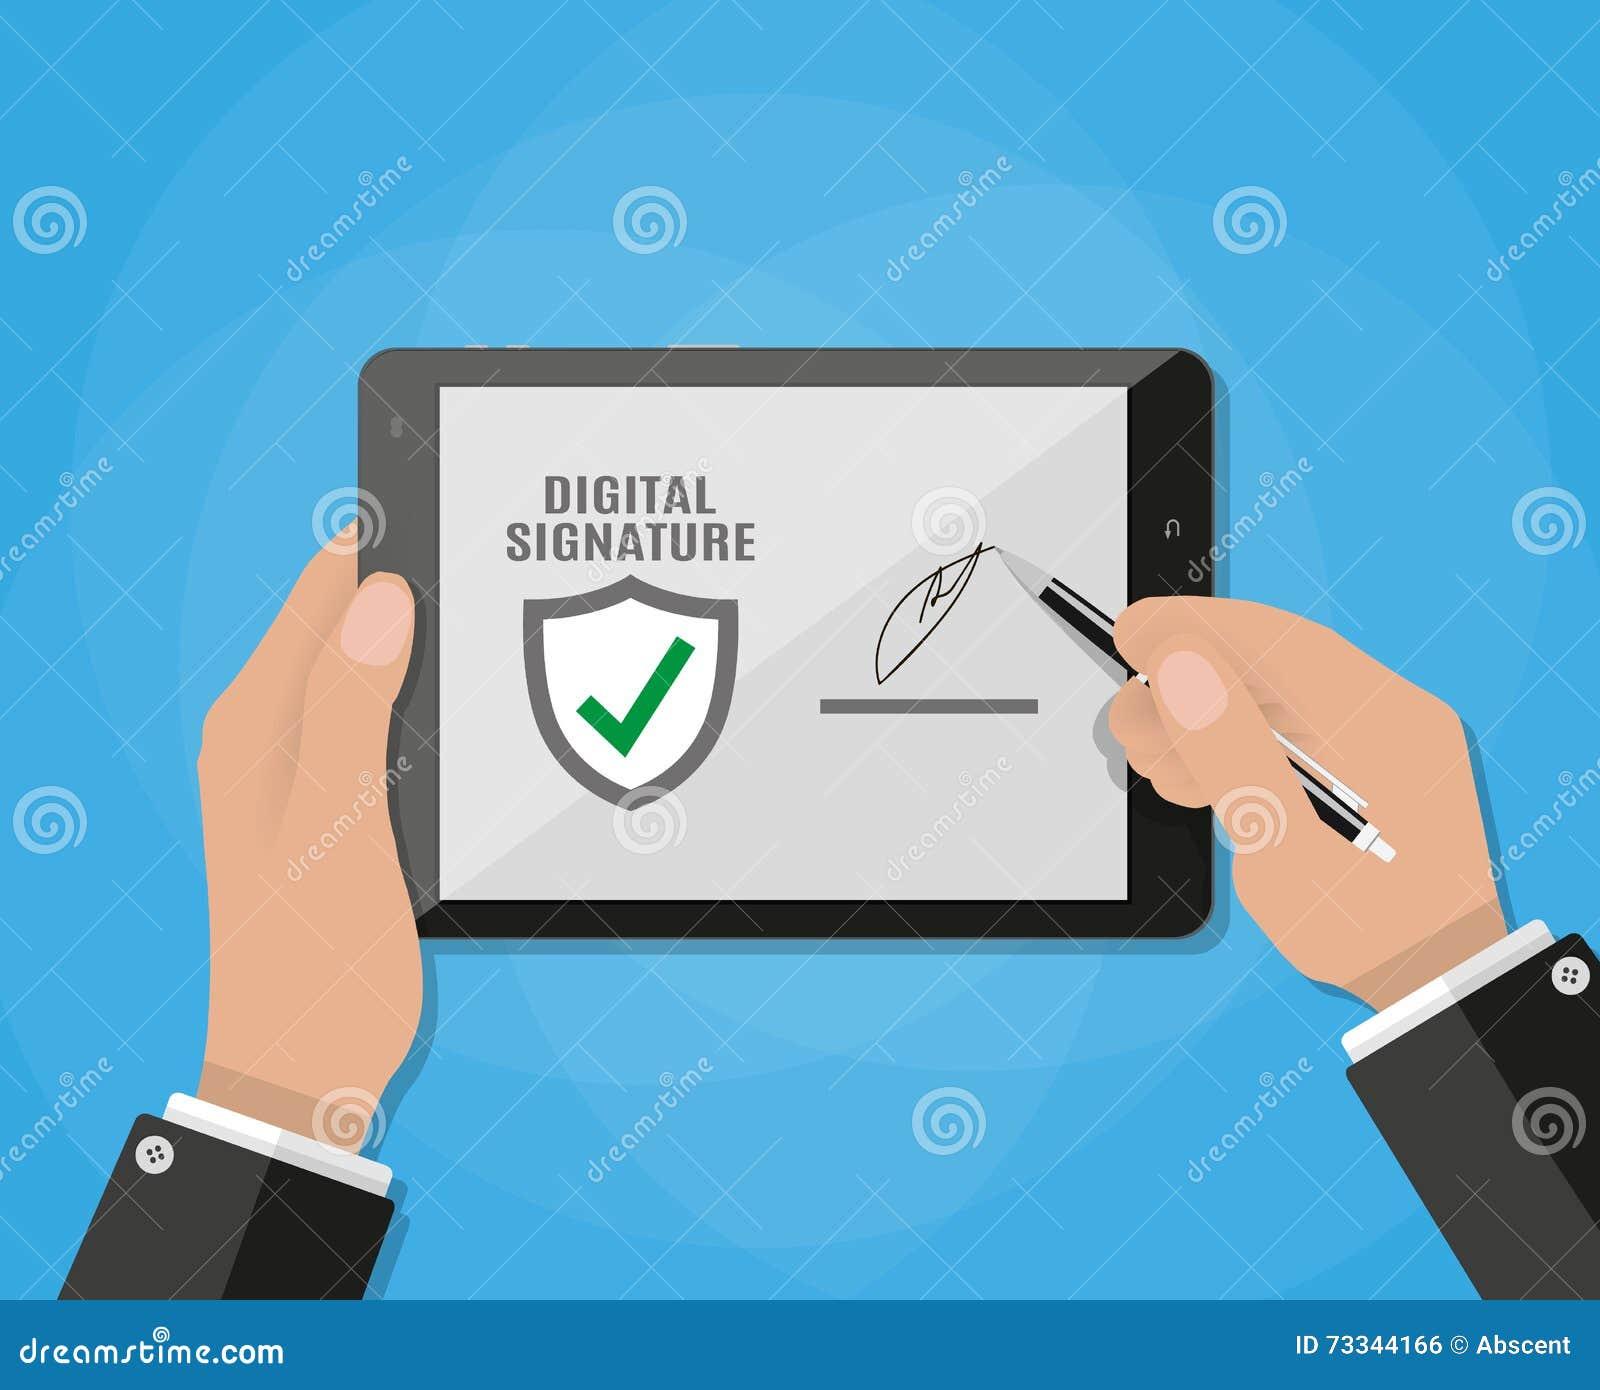 sign pdf with digital signature